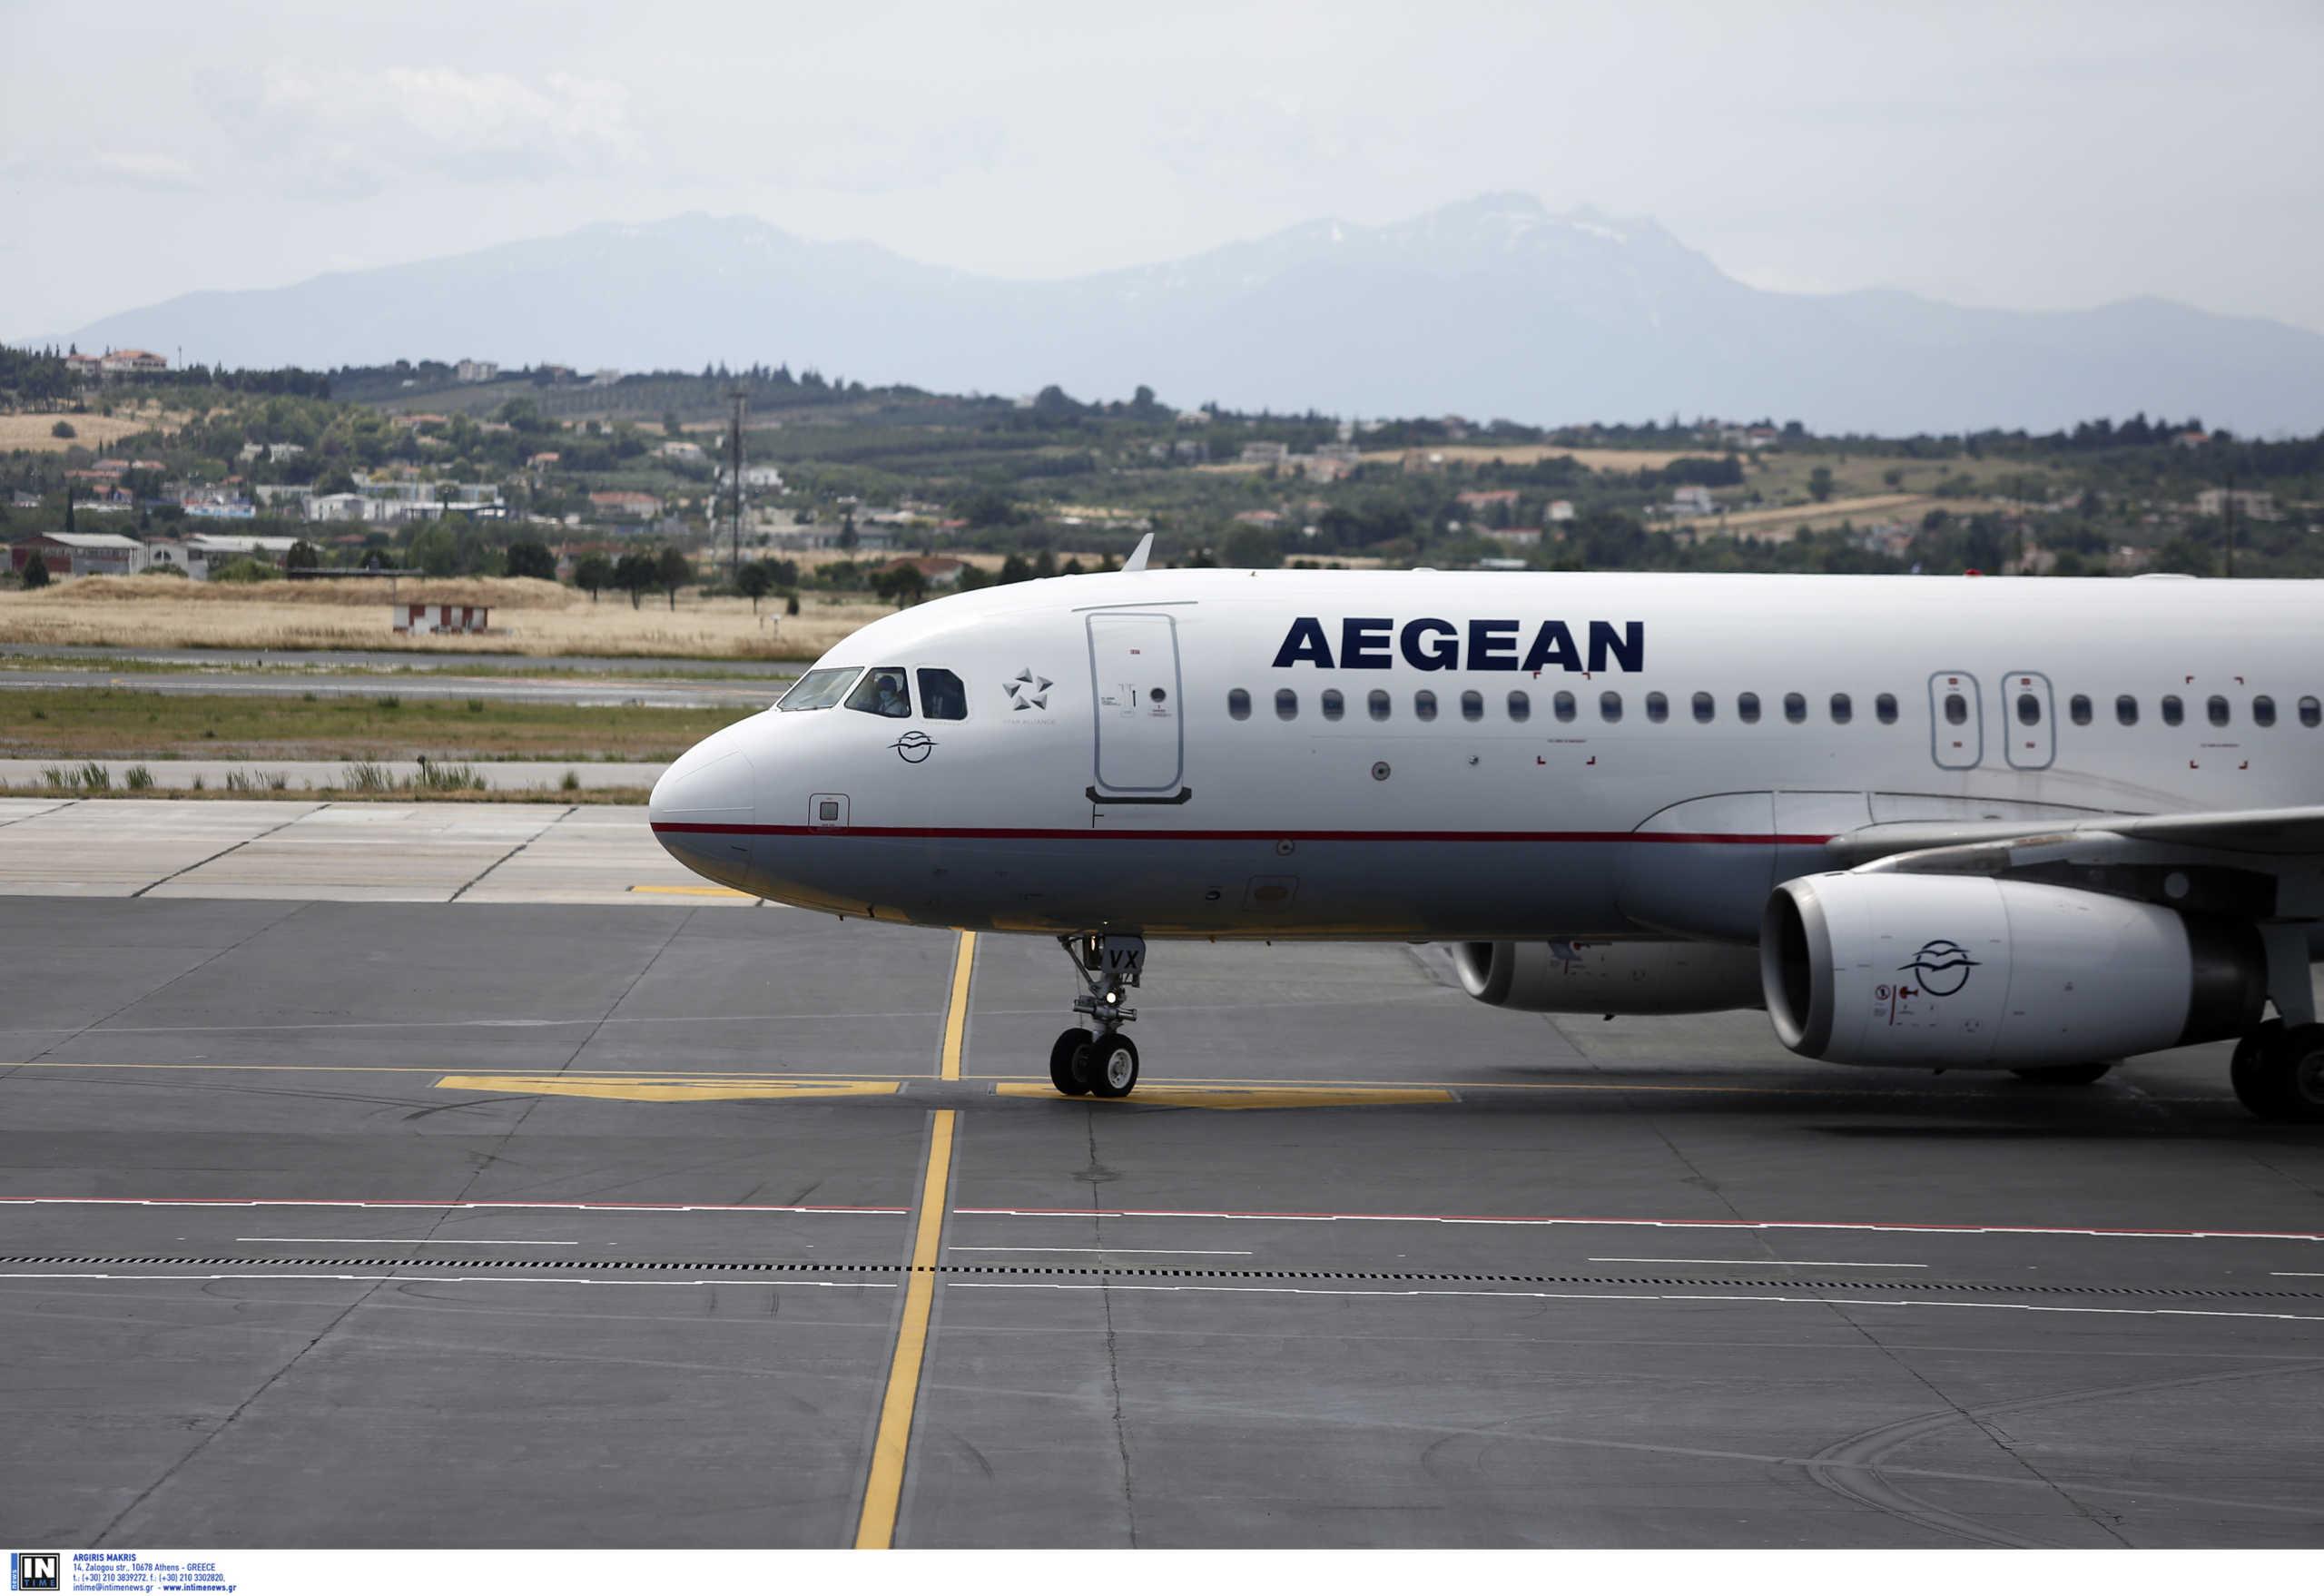 Aegean AEGEAN